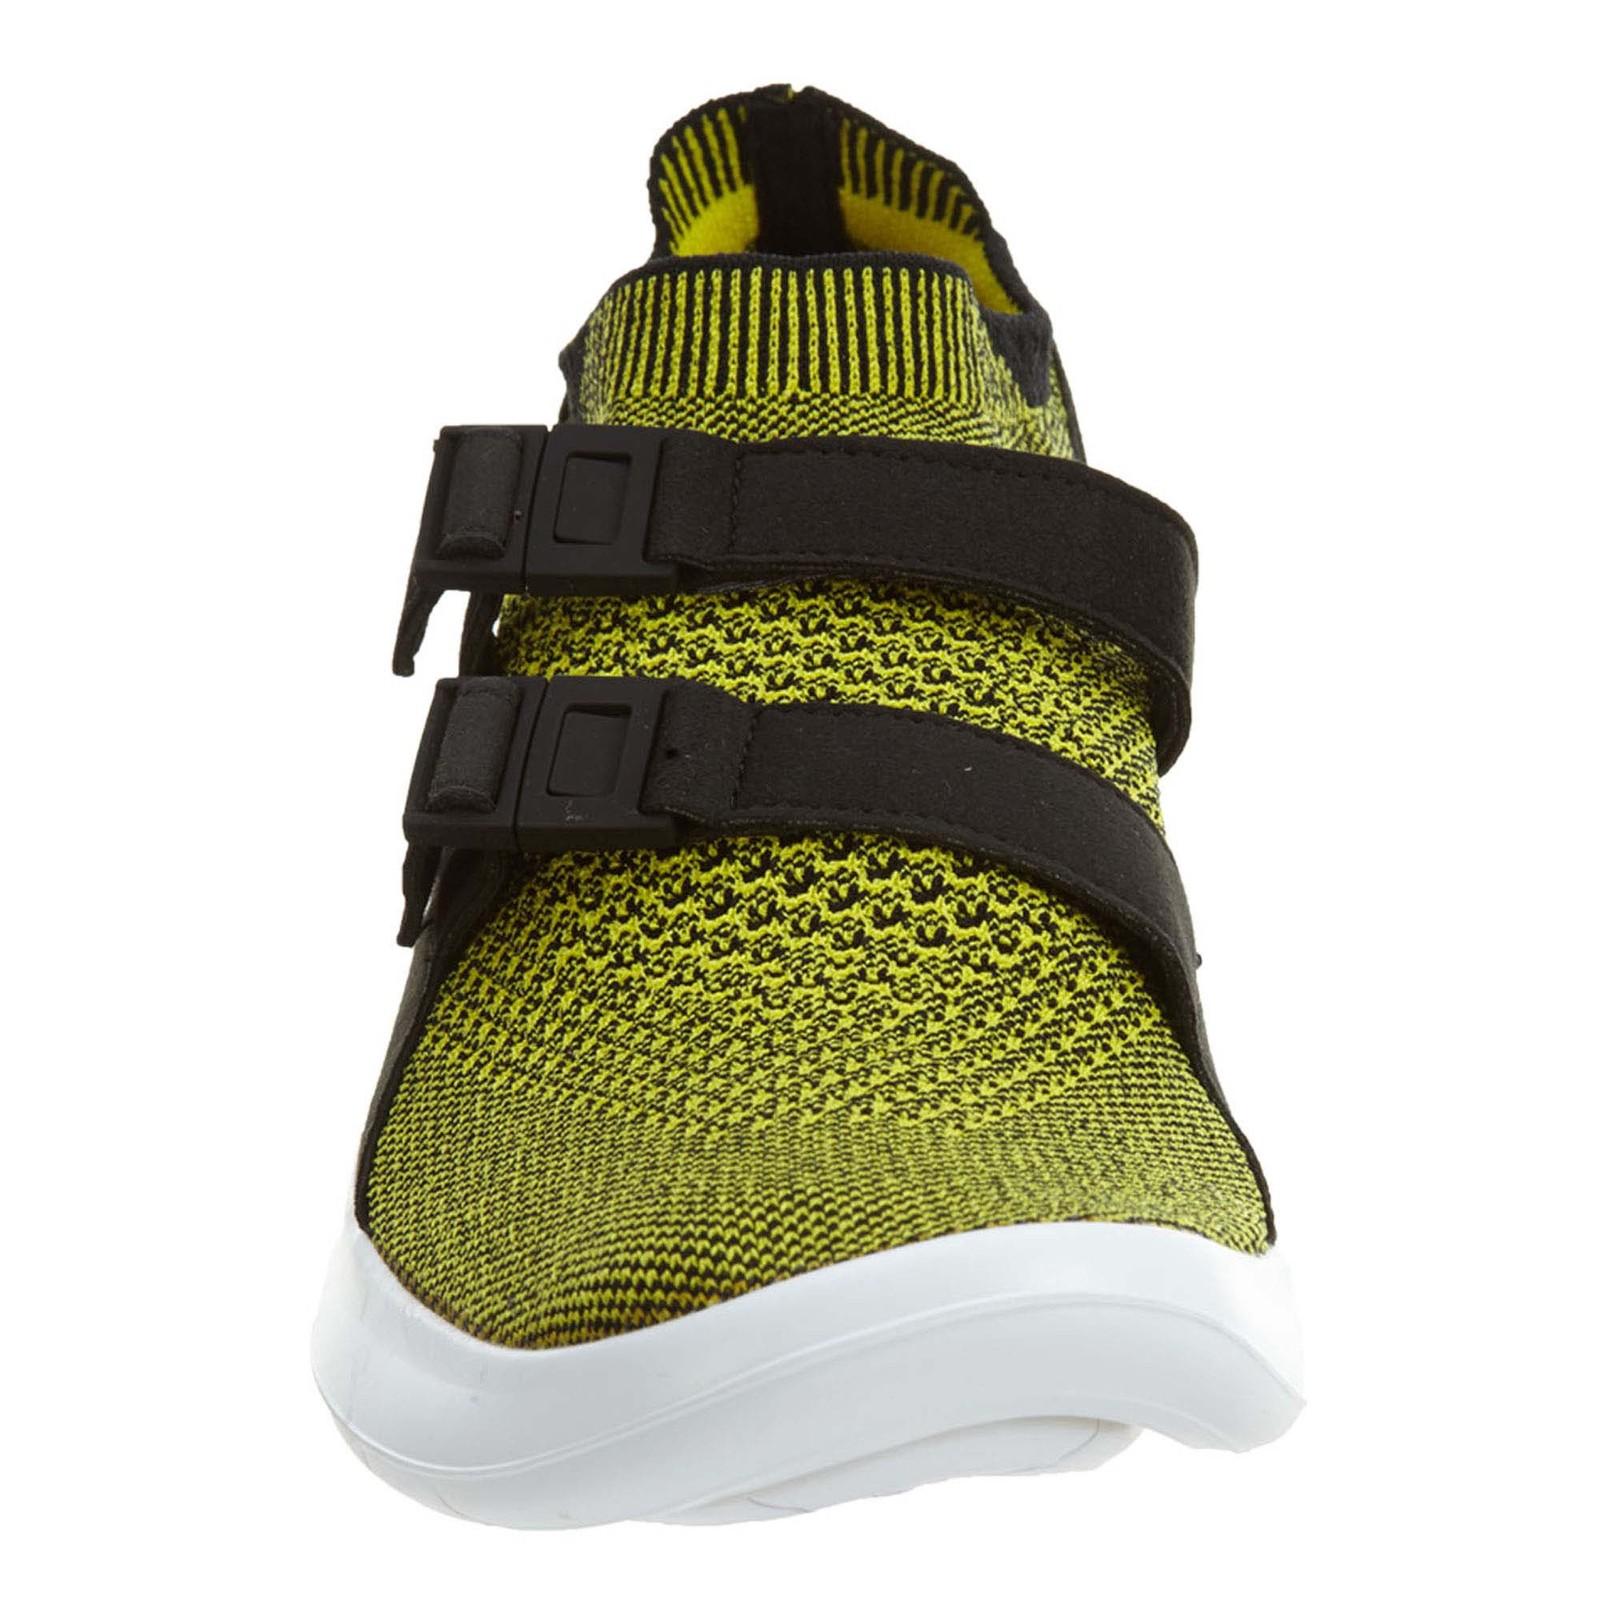 Nike Air Sockracer Flyknit Mens Style : 898022